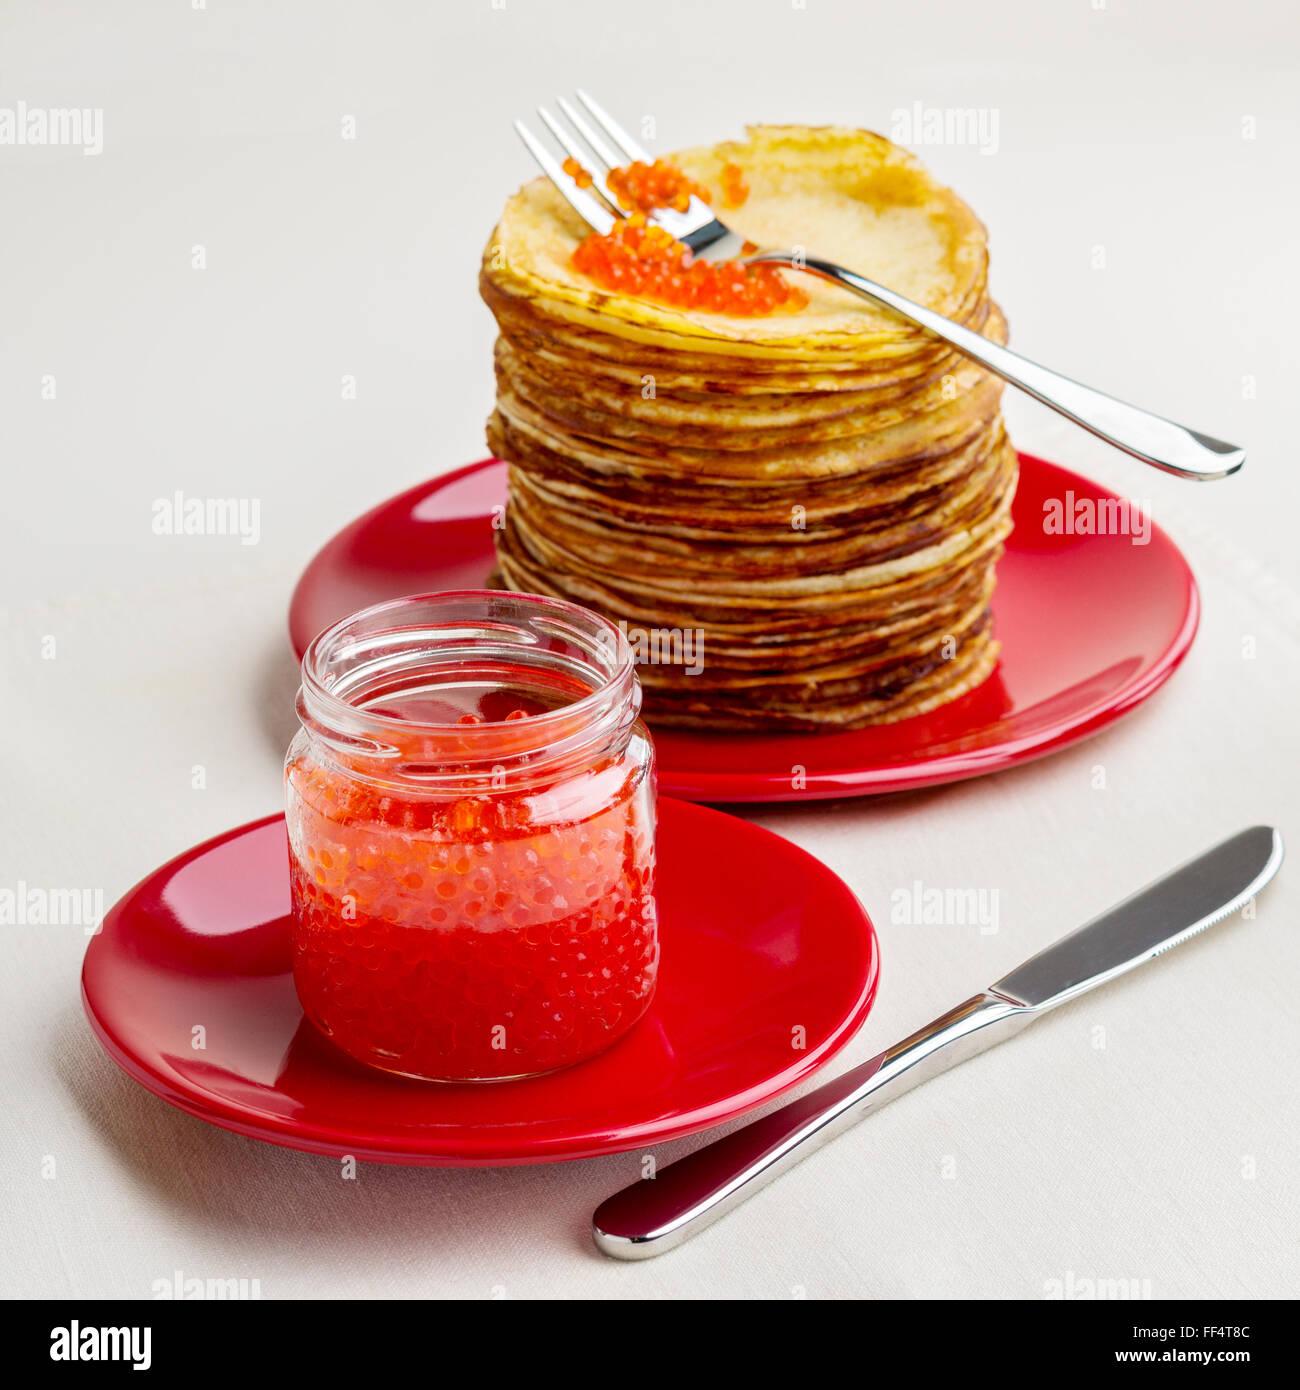 Pancake week. Pancakes with red caviar. Selective focus. - Stock Image